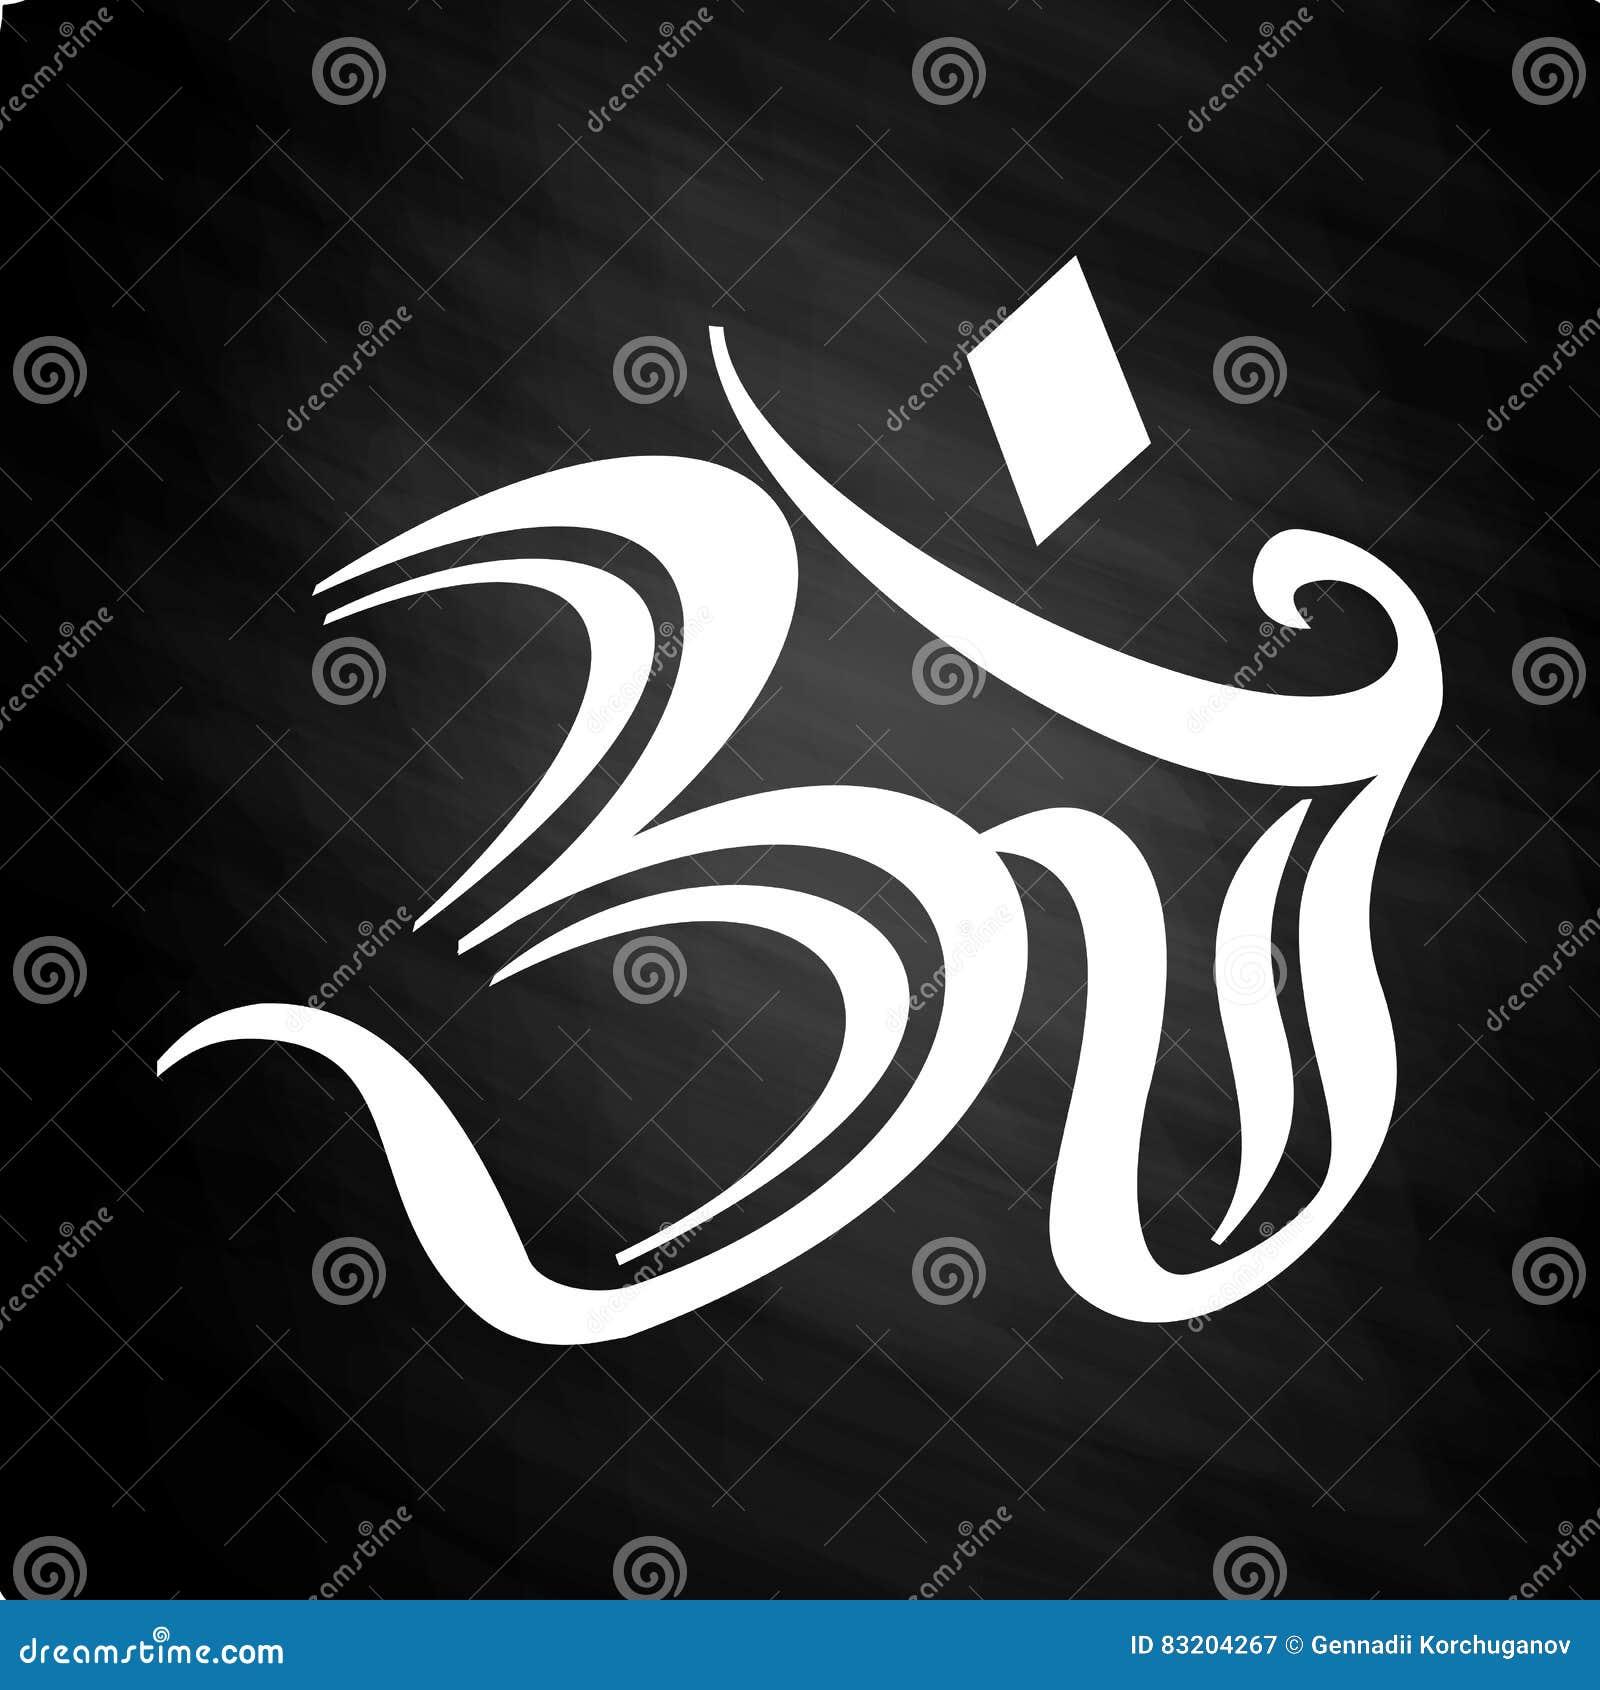 Signe indien om galerie tatouage - Symbole indien signification ...